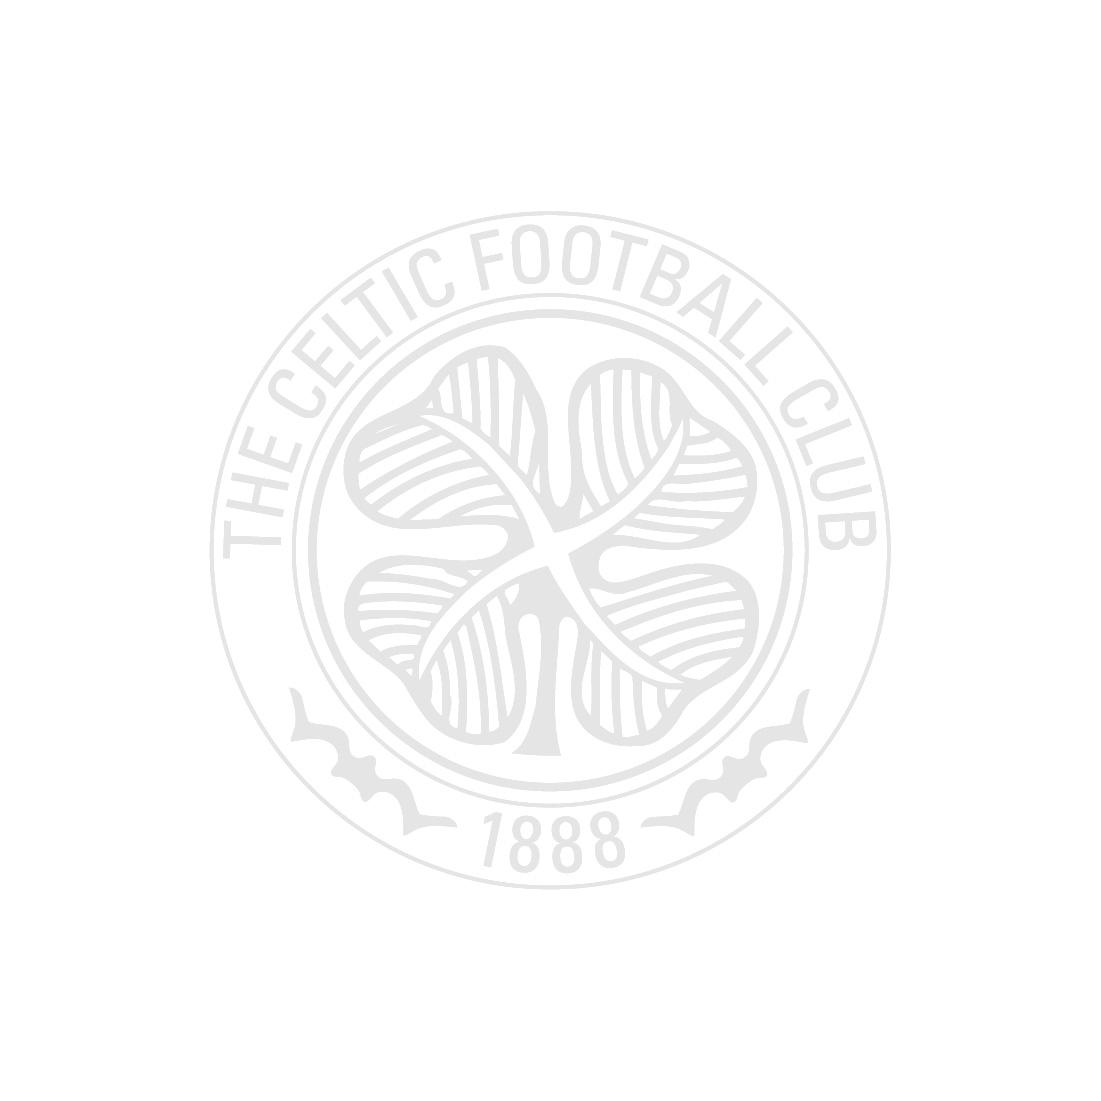 Celtic Mens Elite Third Shirt 19/20 with Sponsor